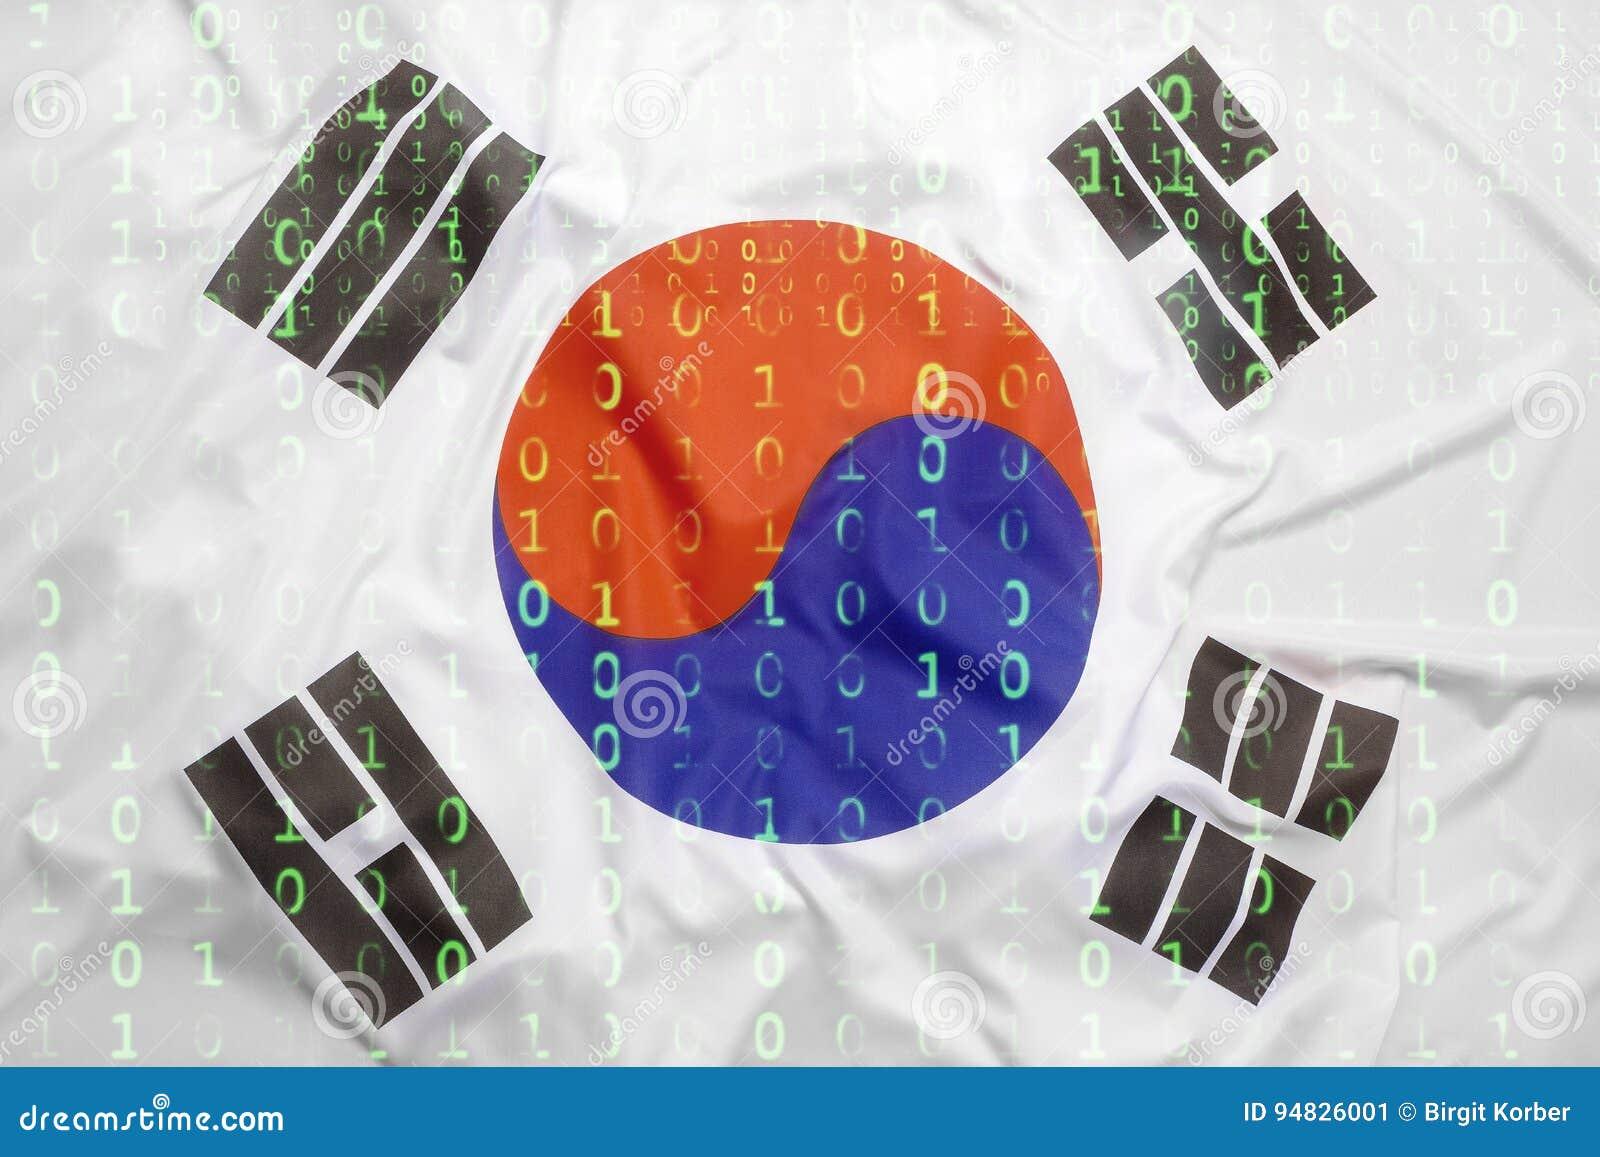 Binary code with South Korea flag, data protection concept